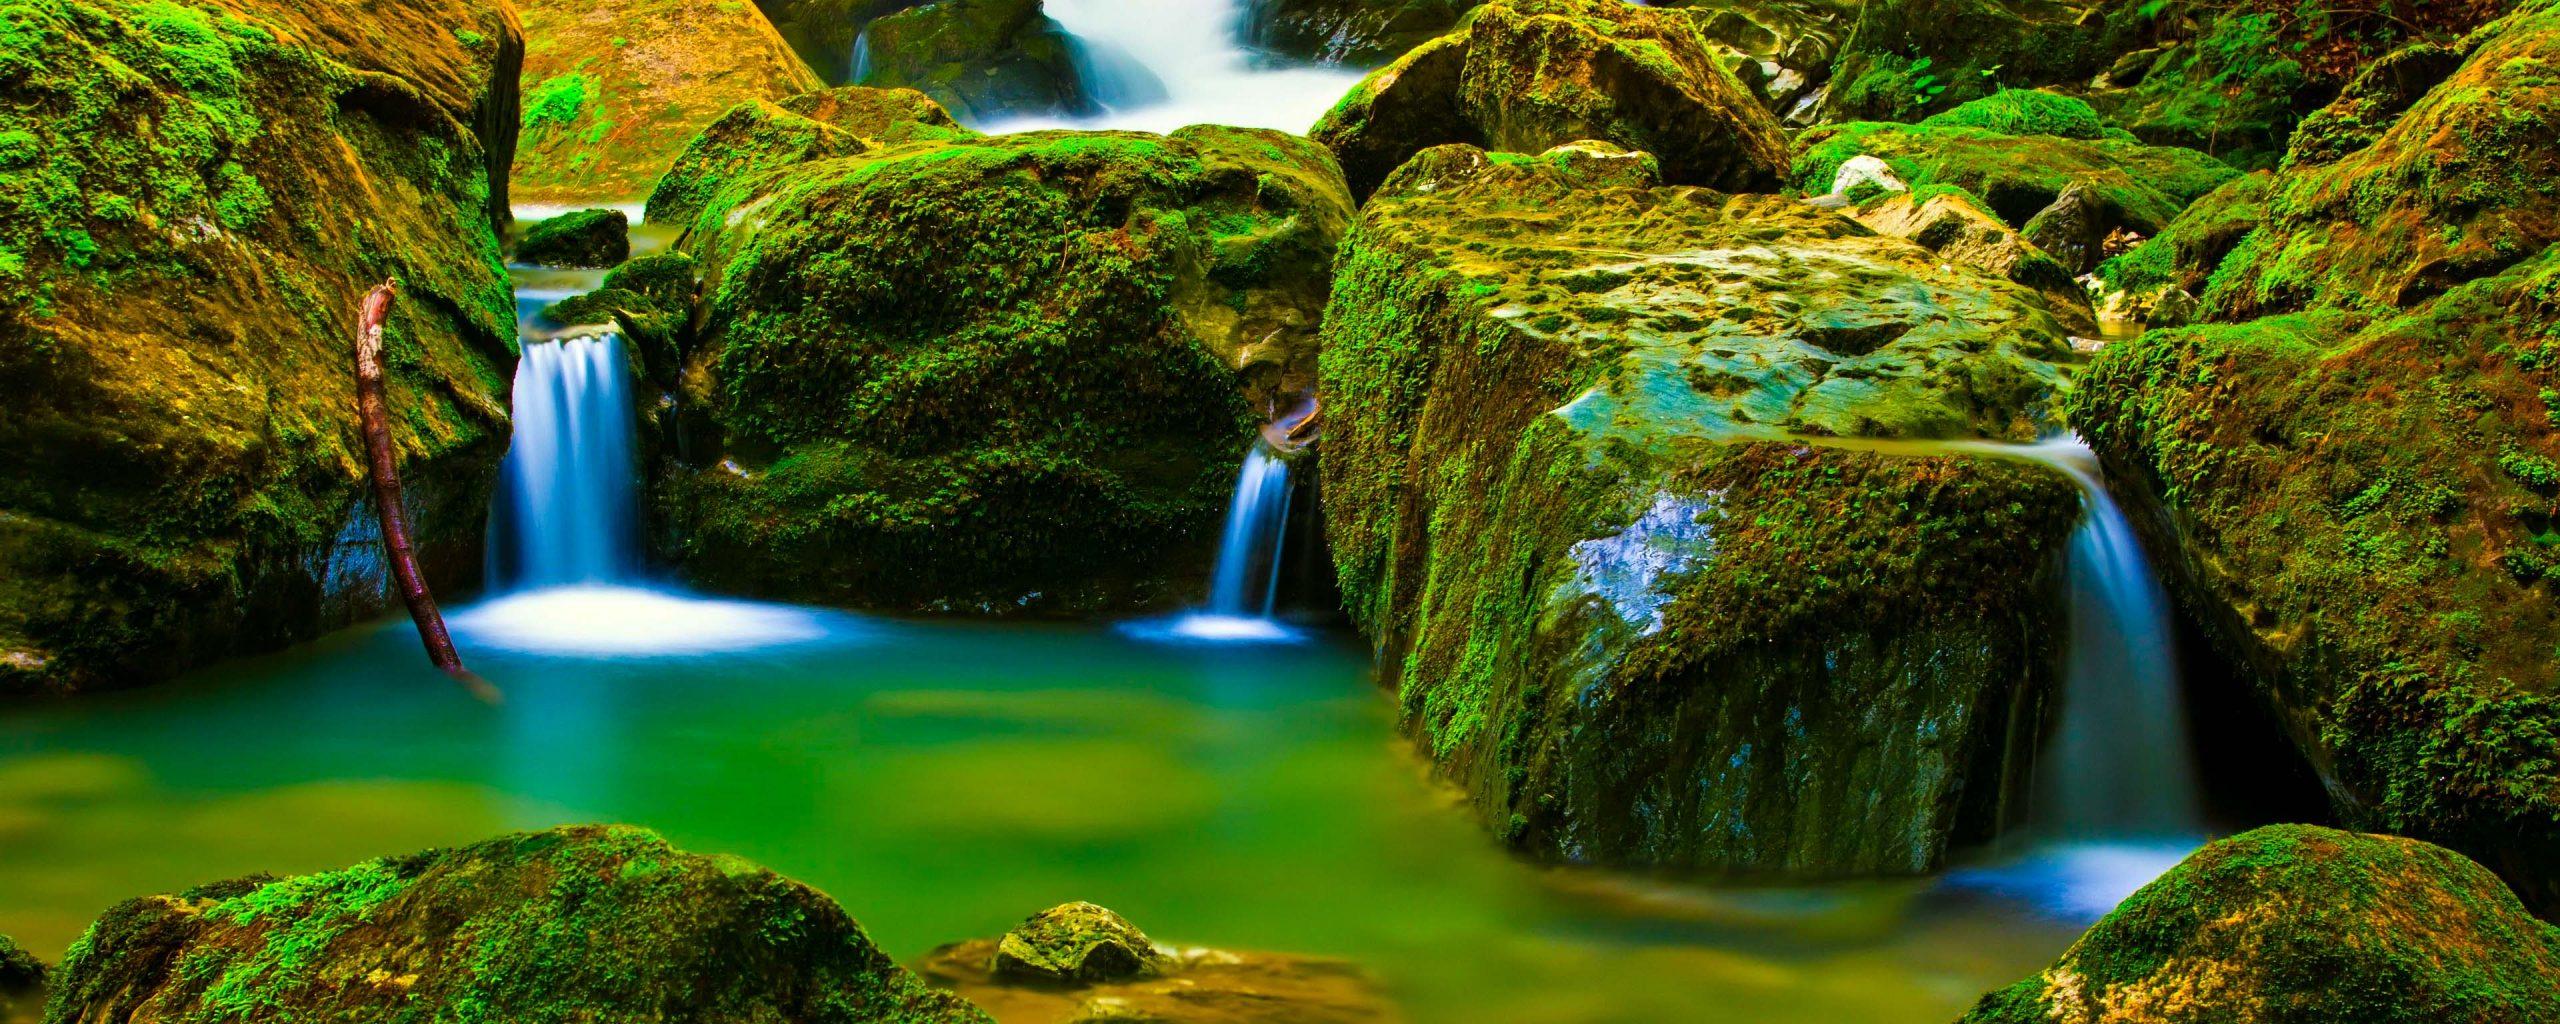 Green Socom 16 In Hdwallpaper: River Water Green Rocks Nature 4K Wallpaper